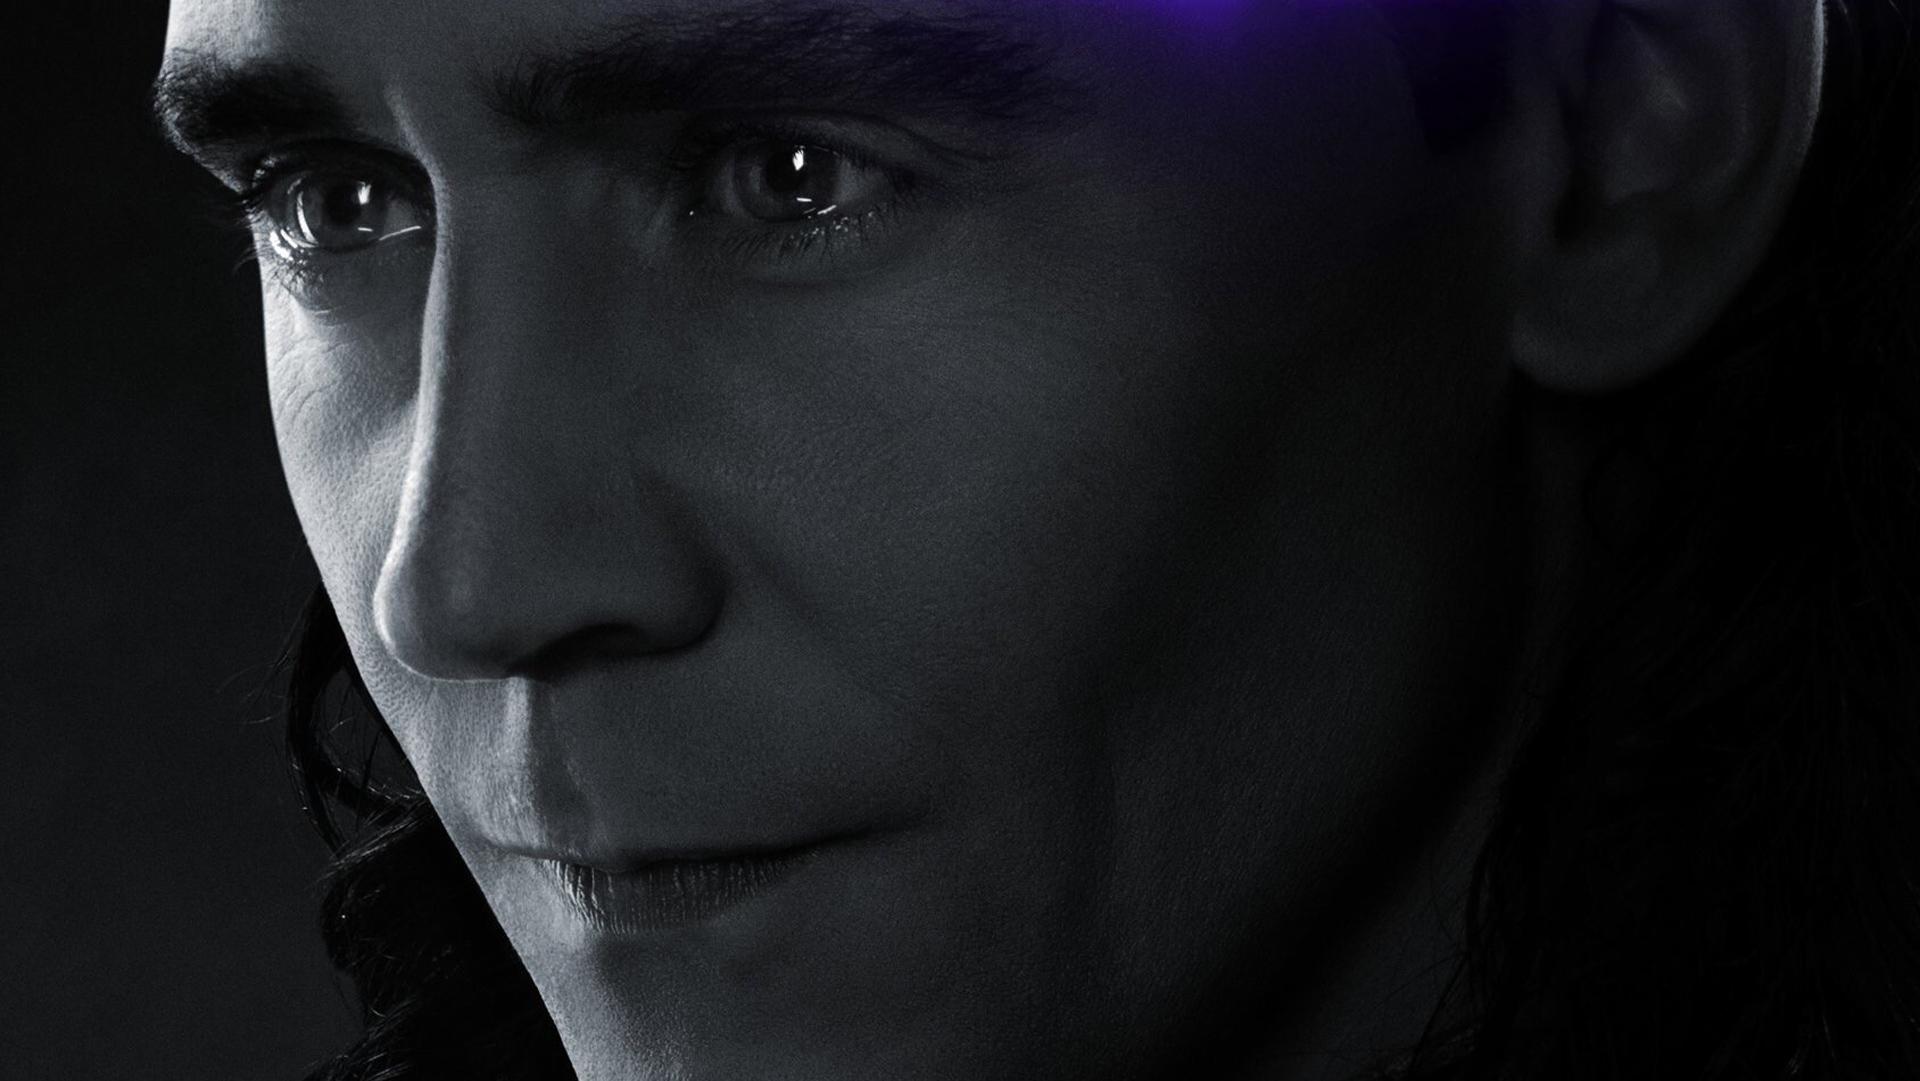 Movie Poster 2019: Loki Avengers Endgame 2019 Poster, HD Movies, 4k